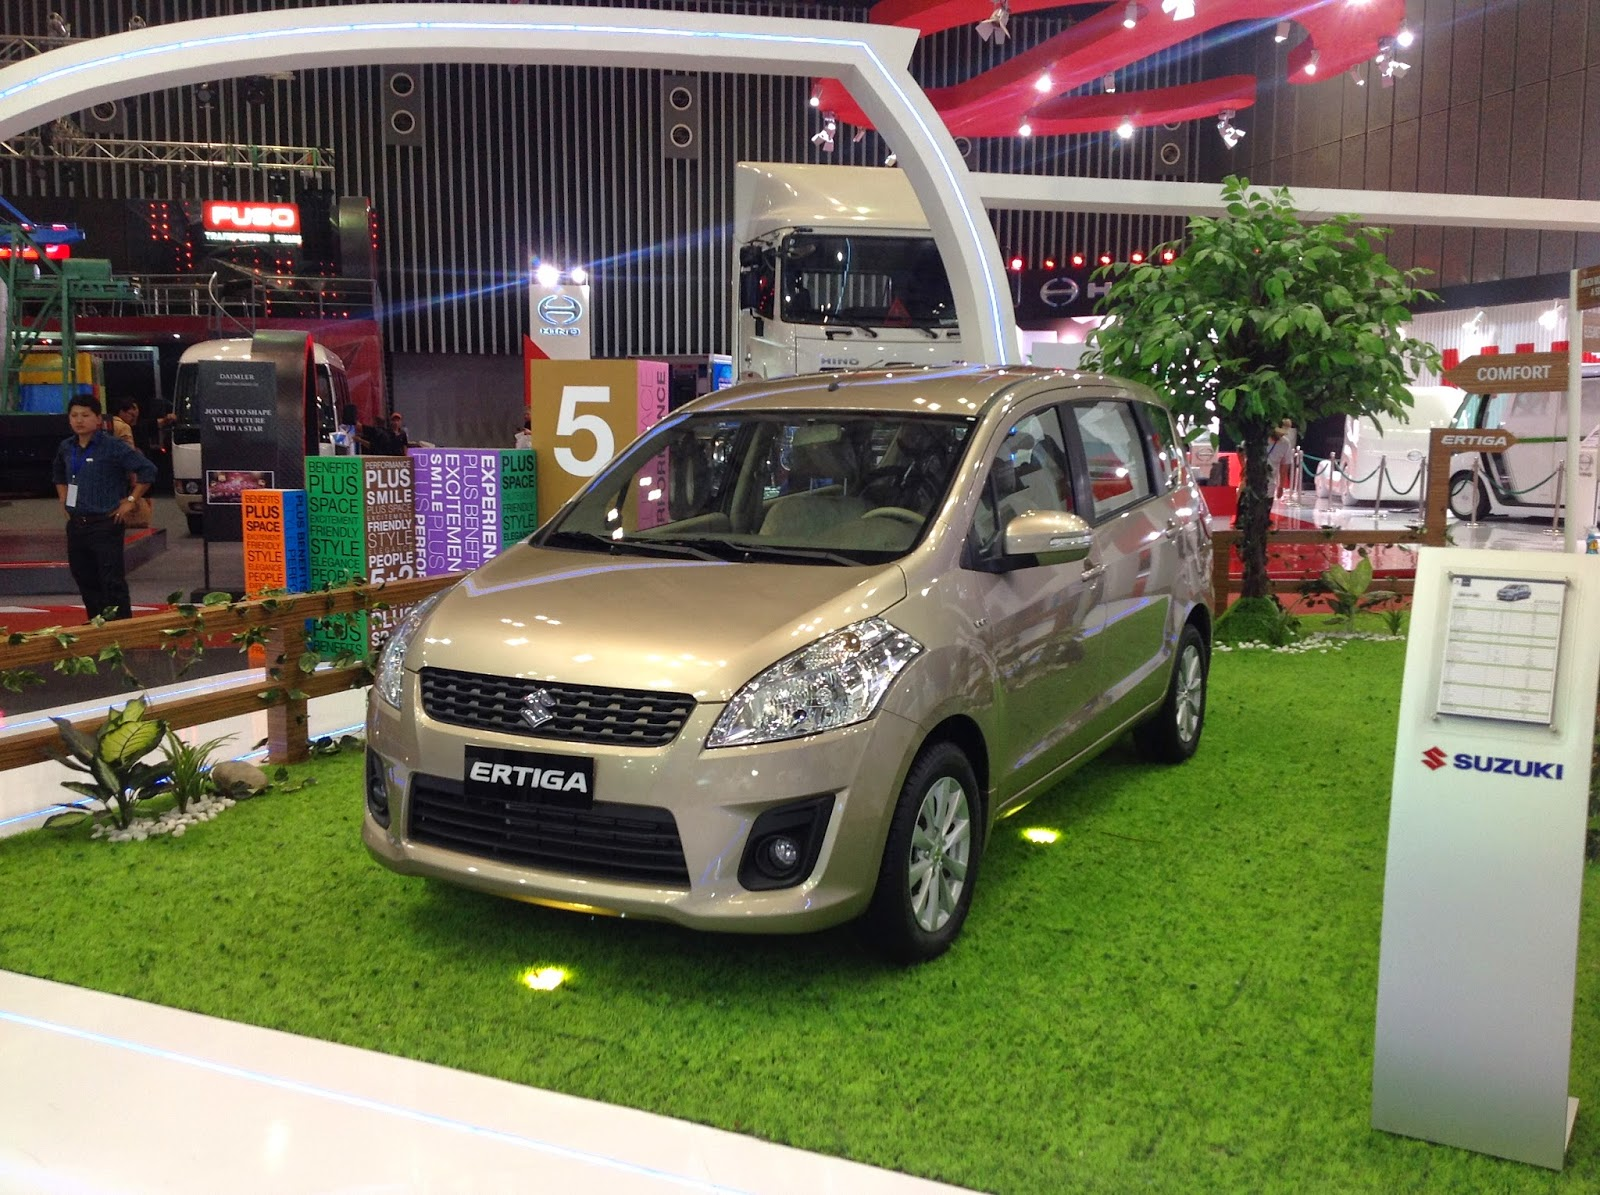 Suzuki Ertiga dòng xe 5+2 bảy chỗ ngồi 2